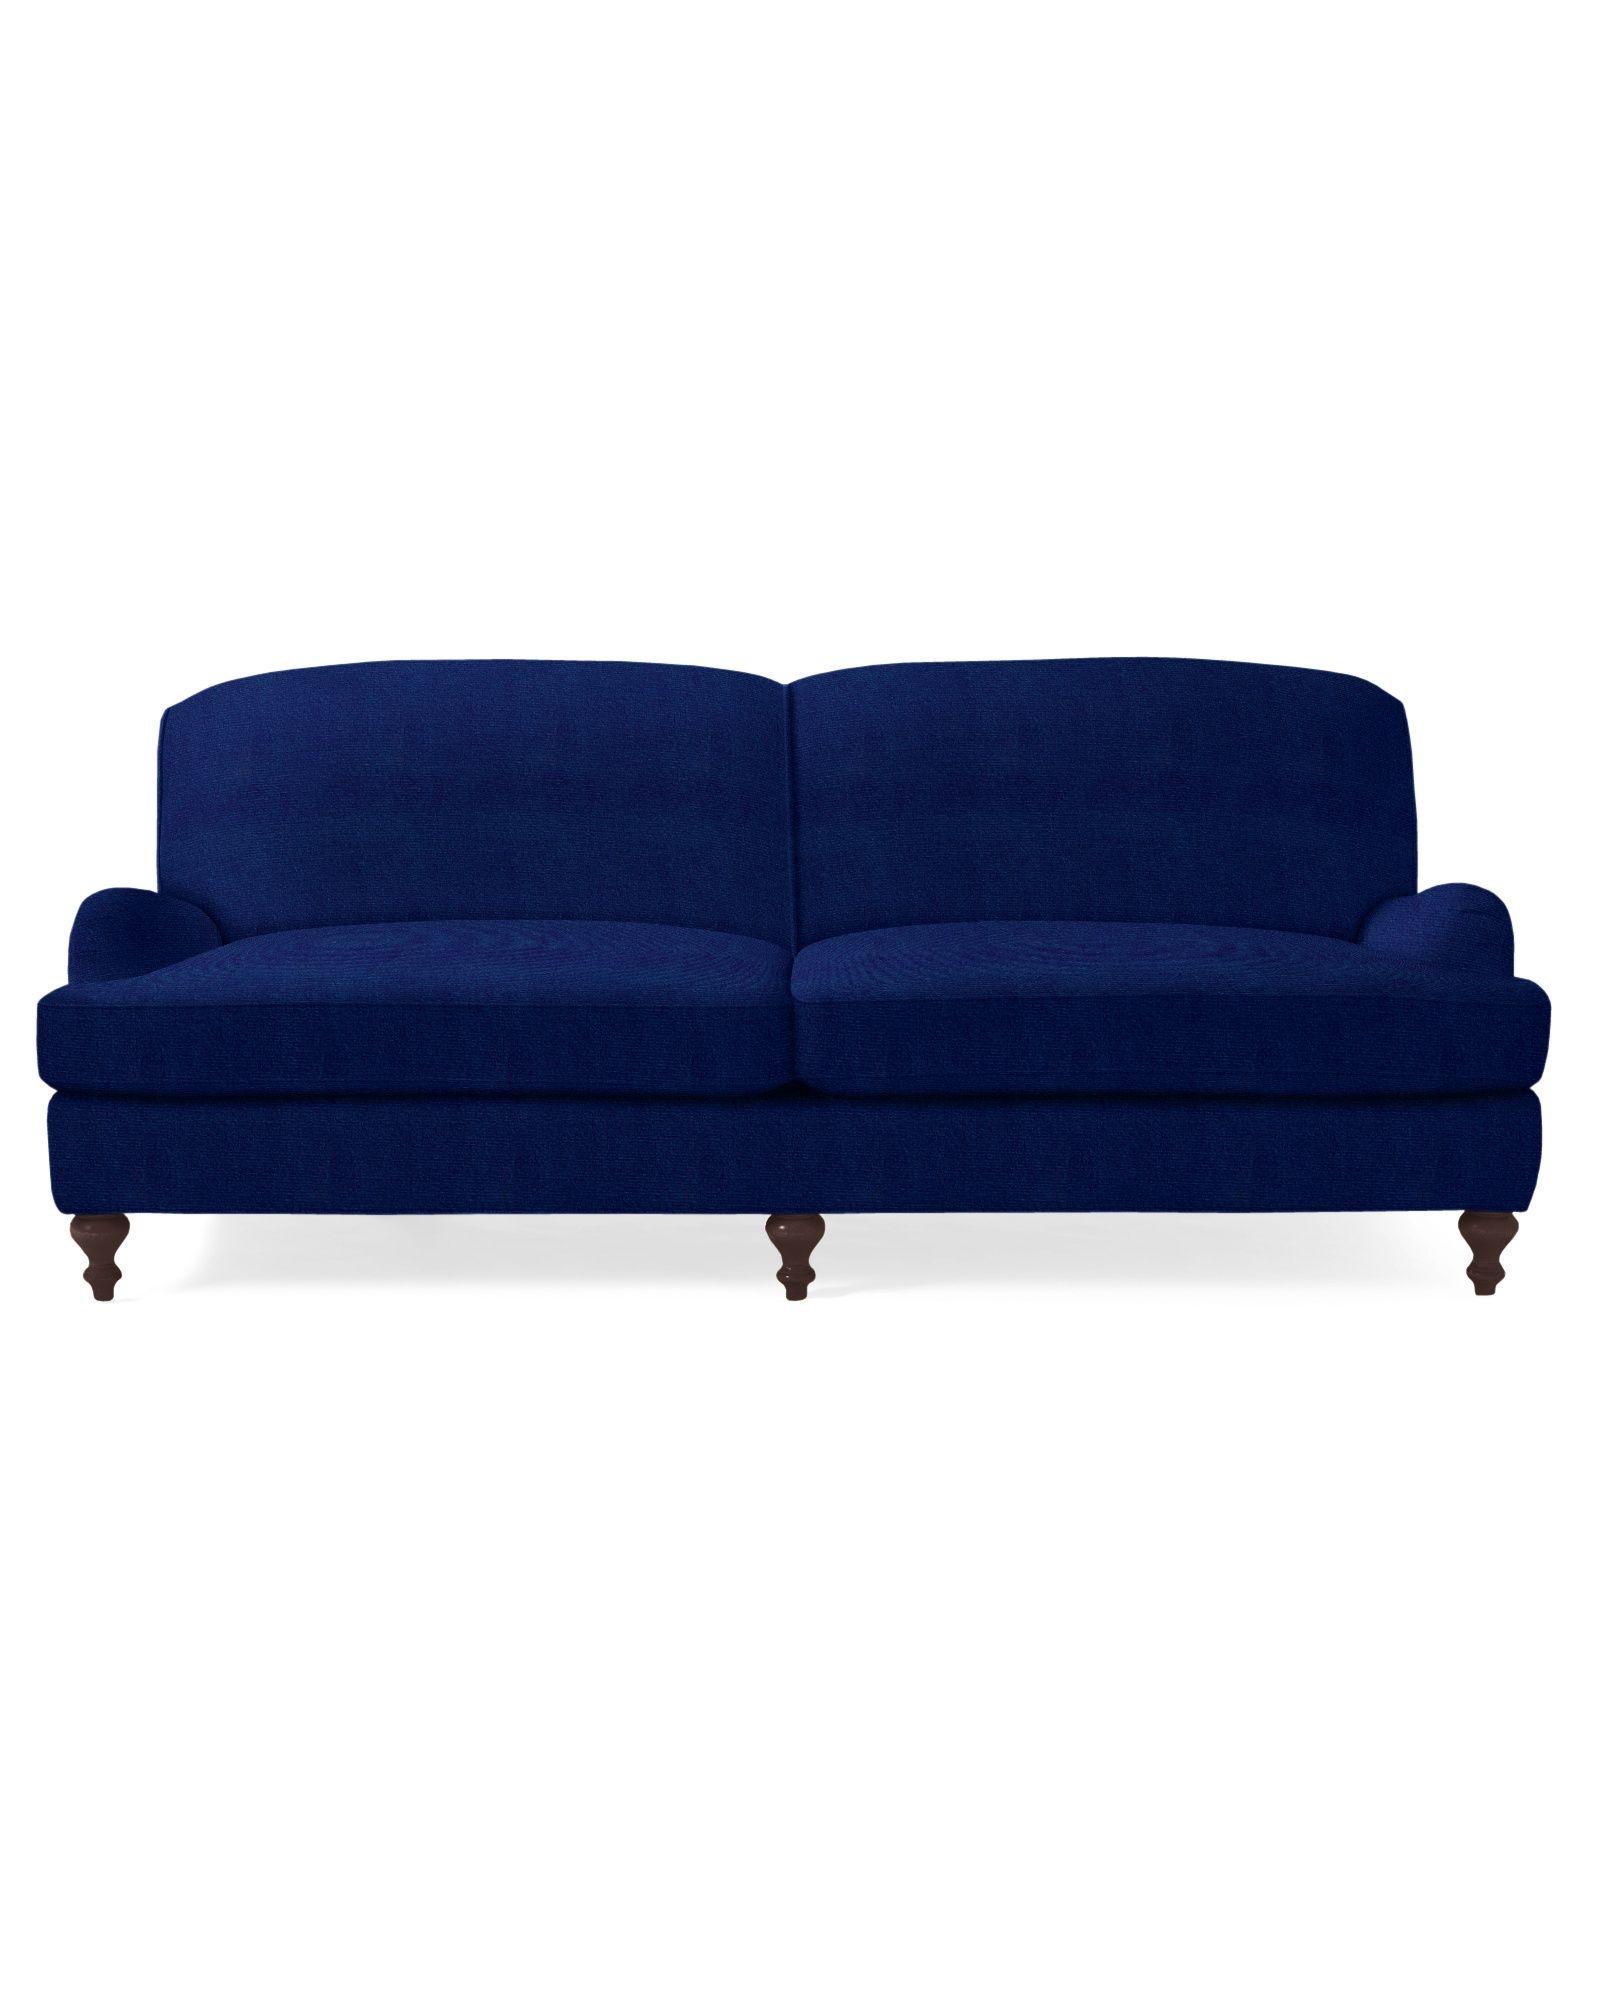 Miramar Sofa  Upholstered  Sofas - Serena And Lily